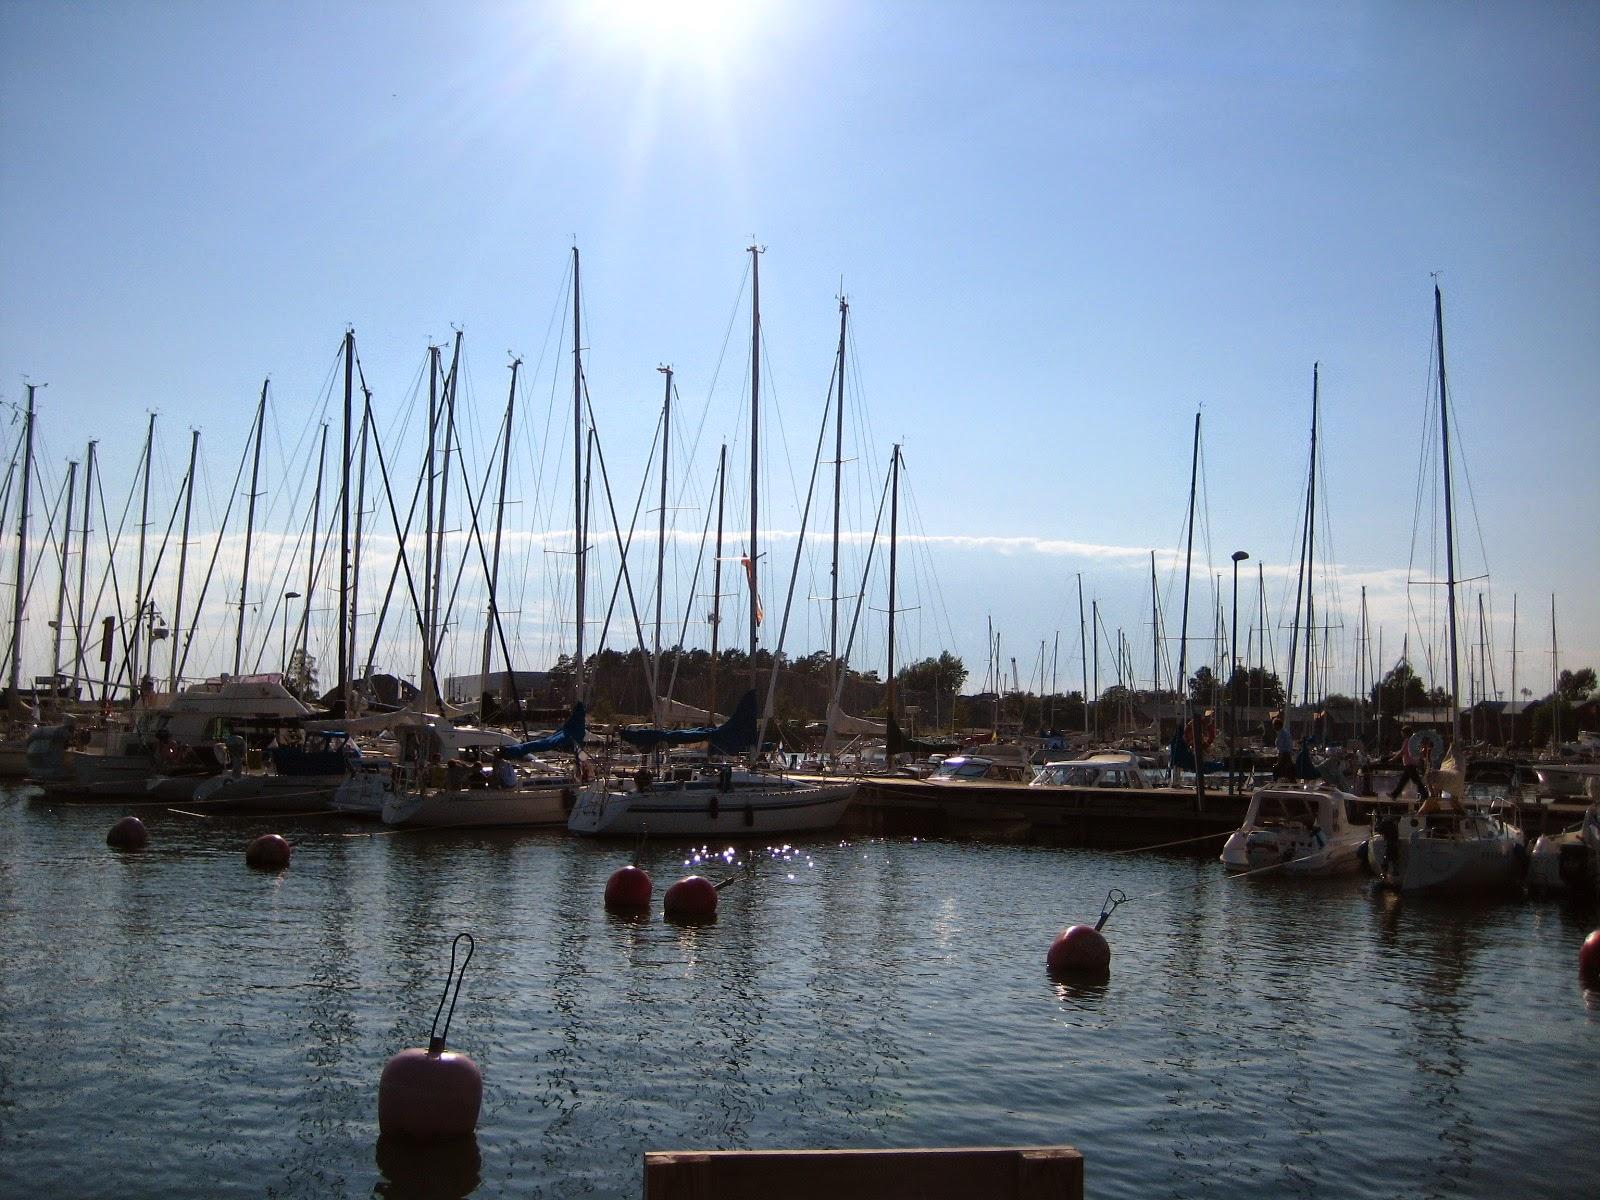 hanko satama harbour